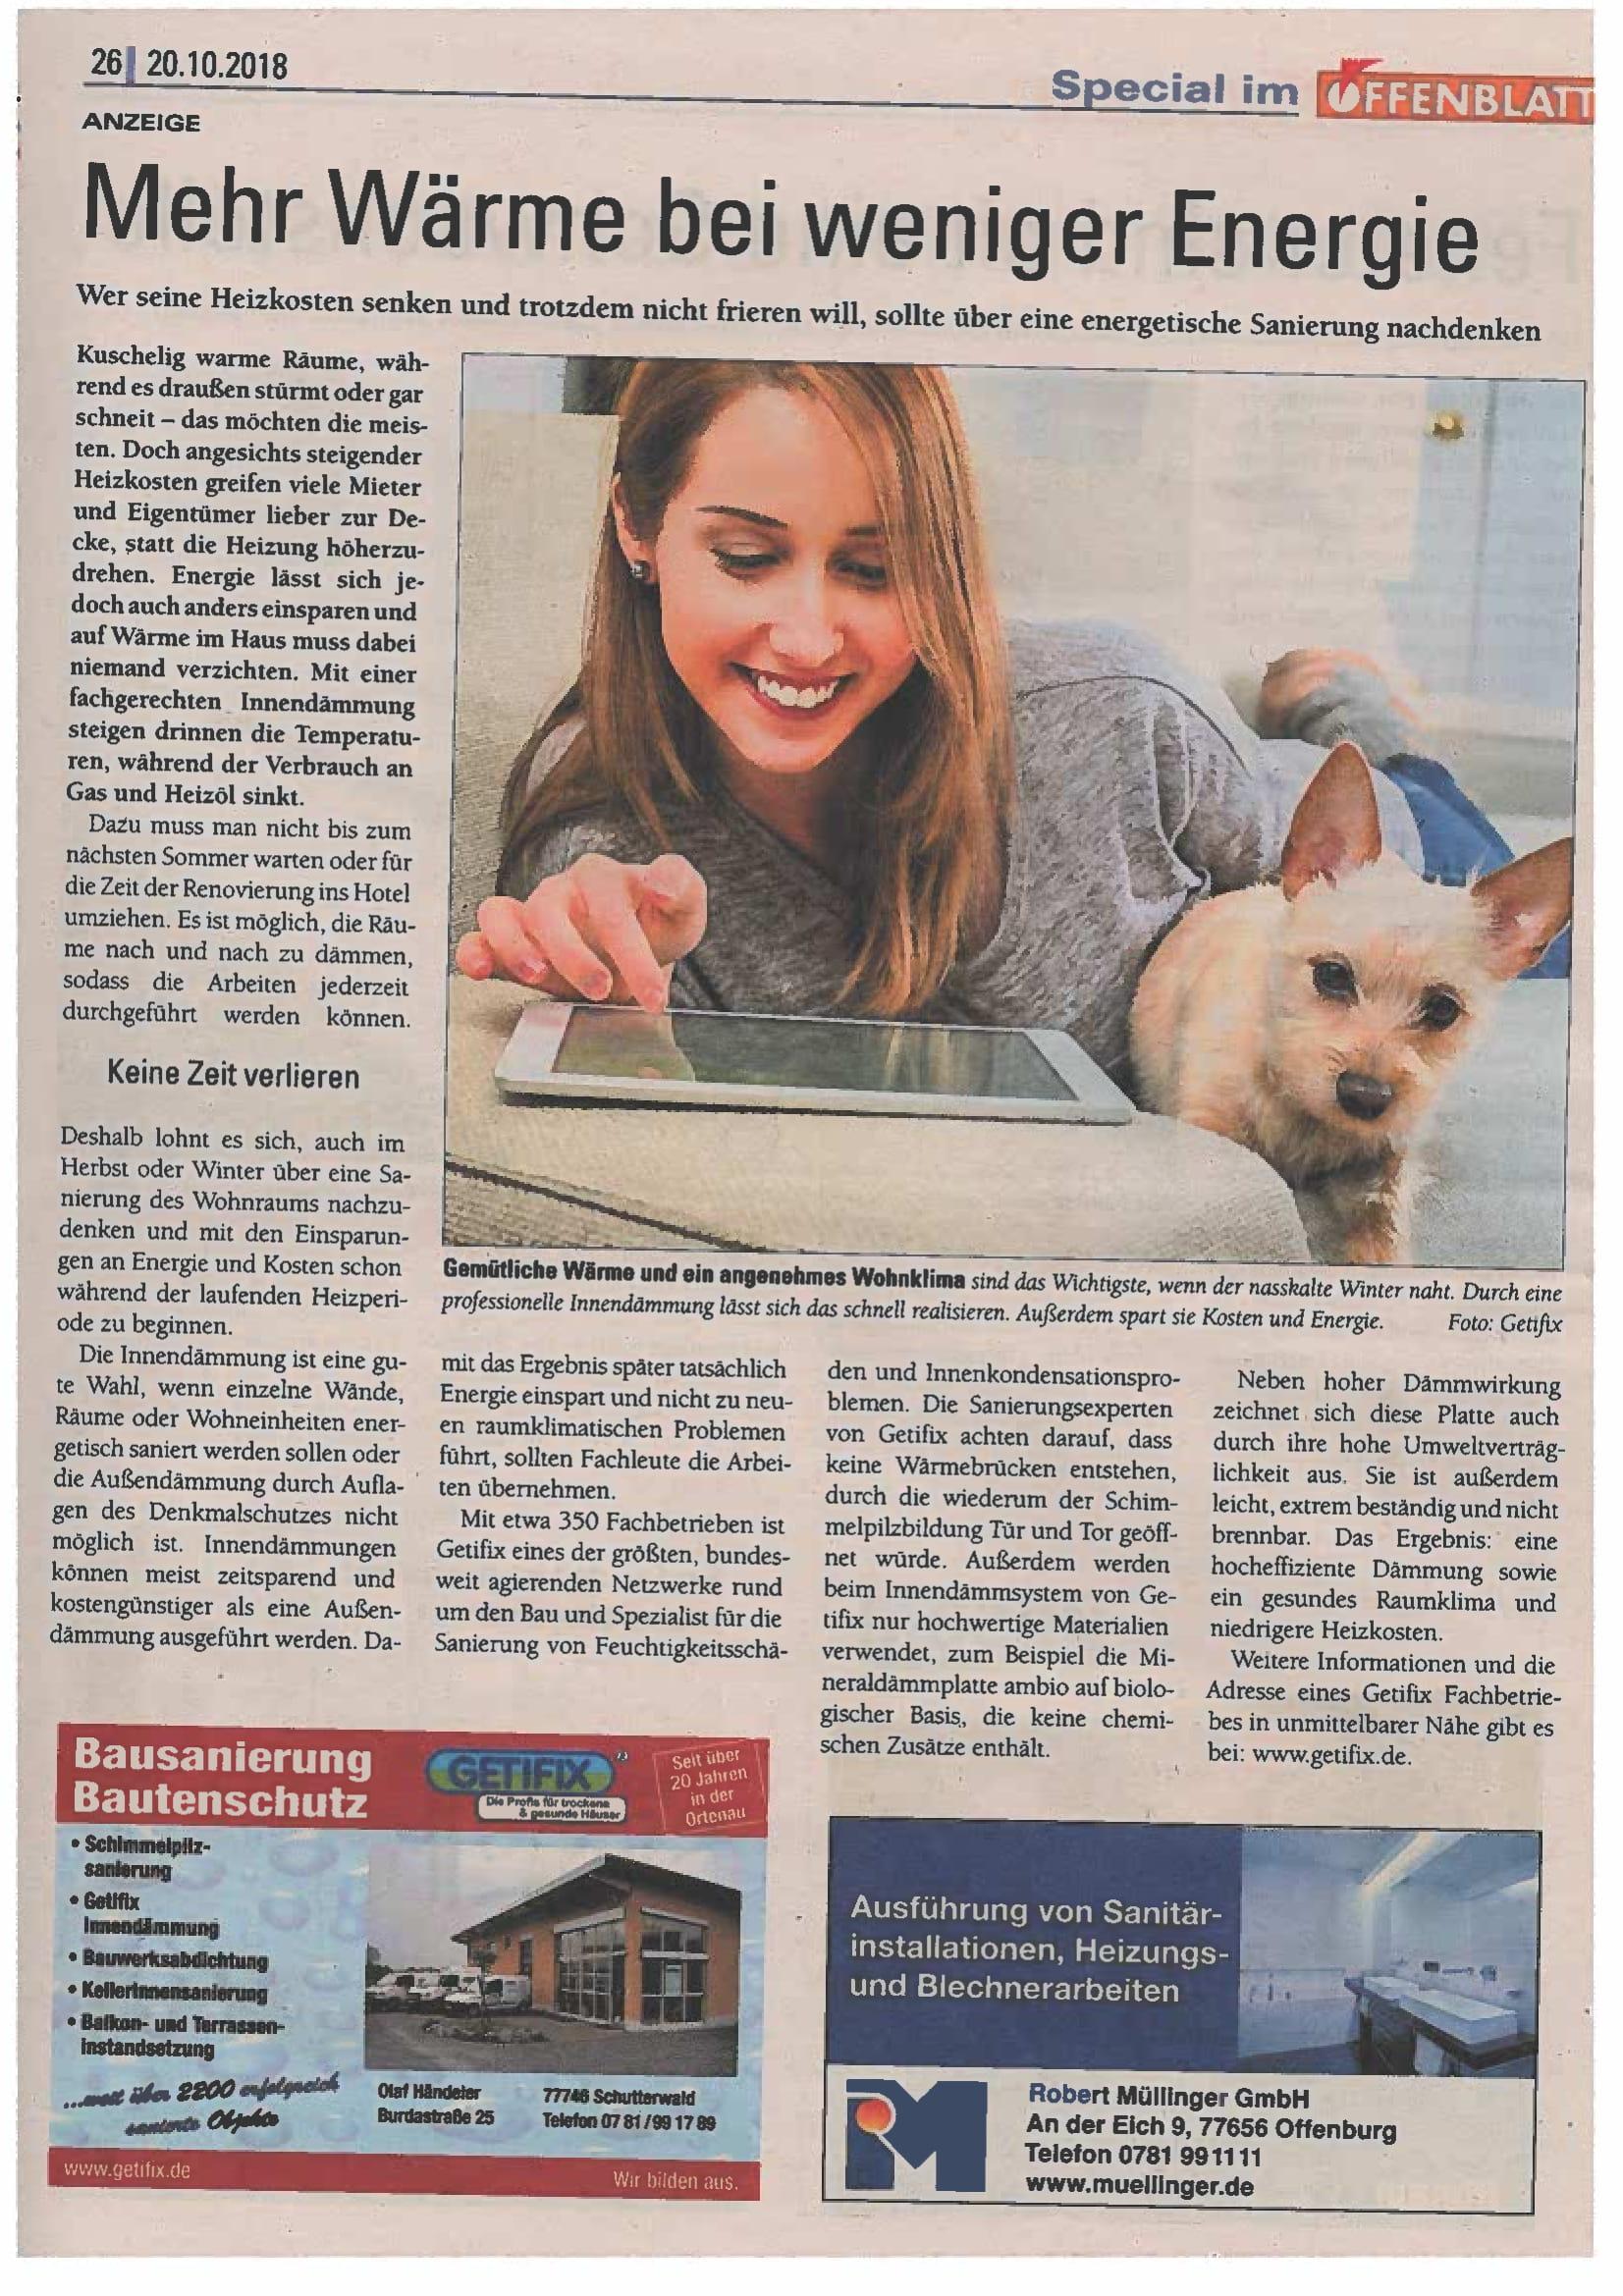 Offenblatt Oktober 2018